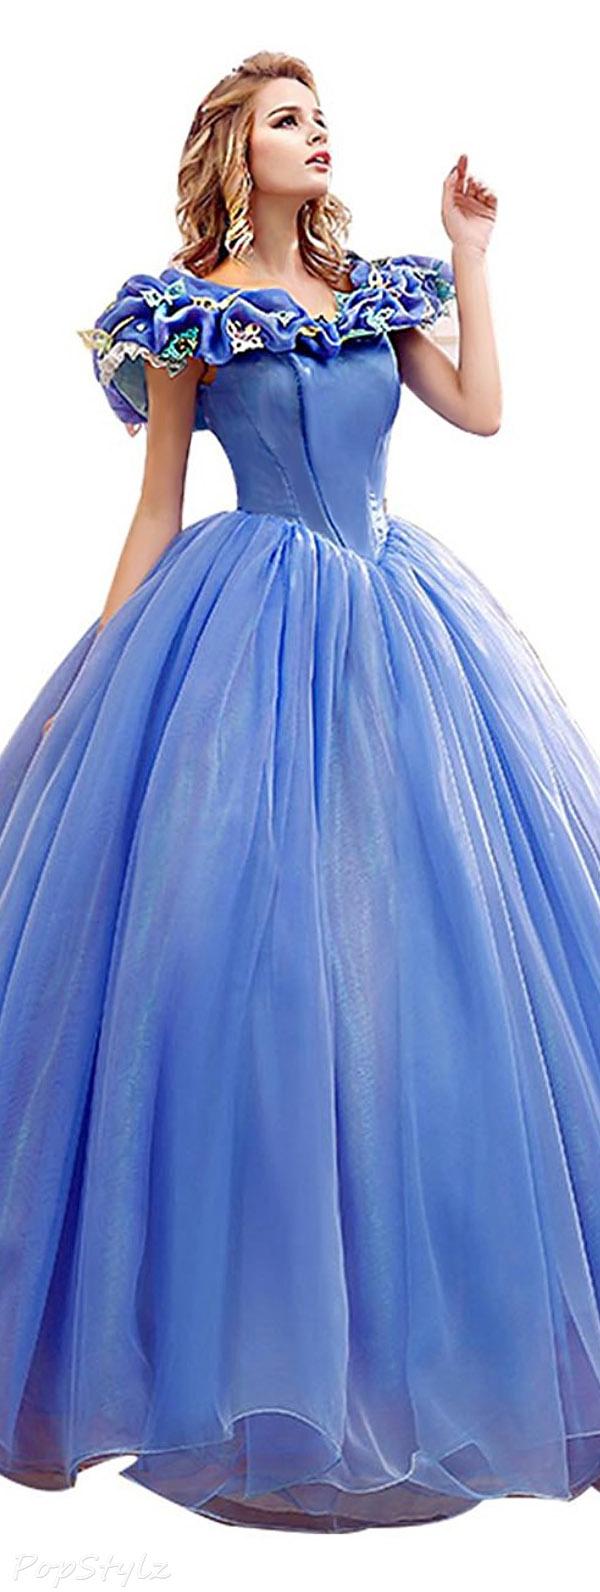 Snowskite Butterfly Princess Cinderella Ball Gown